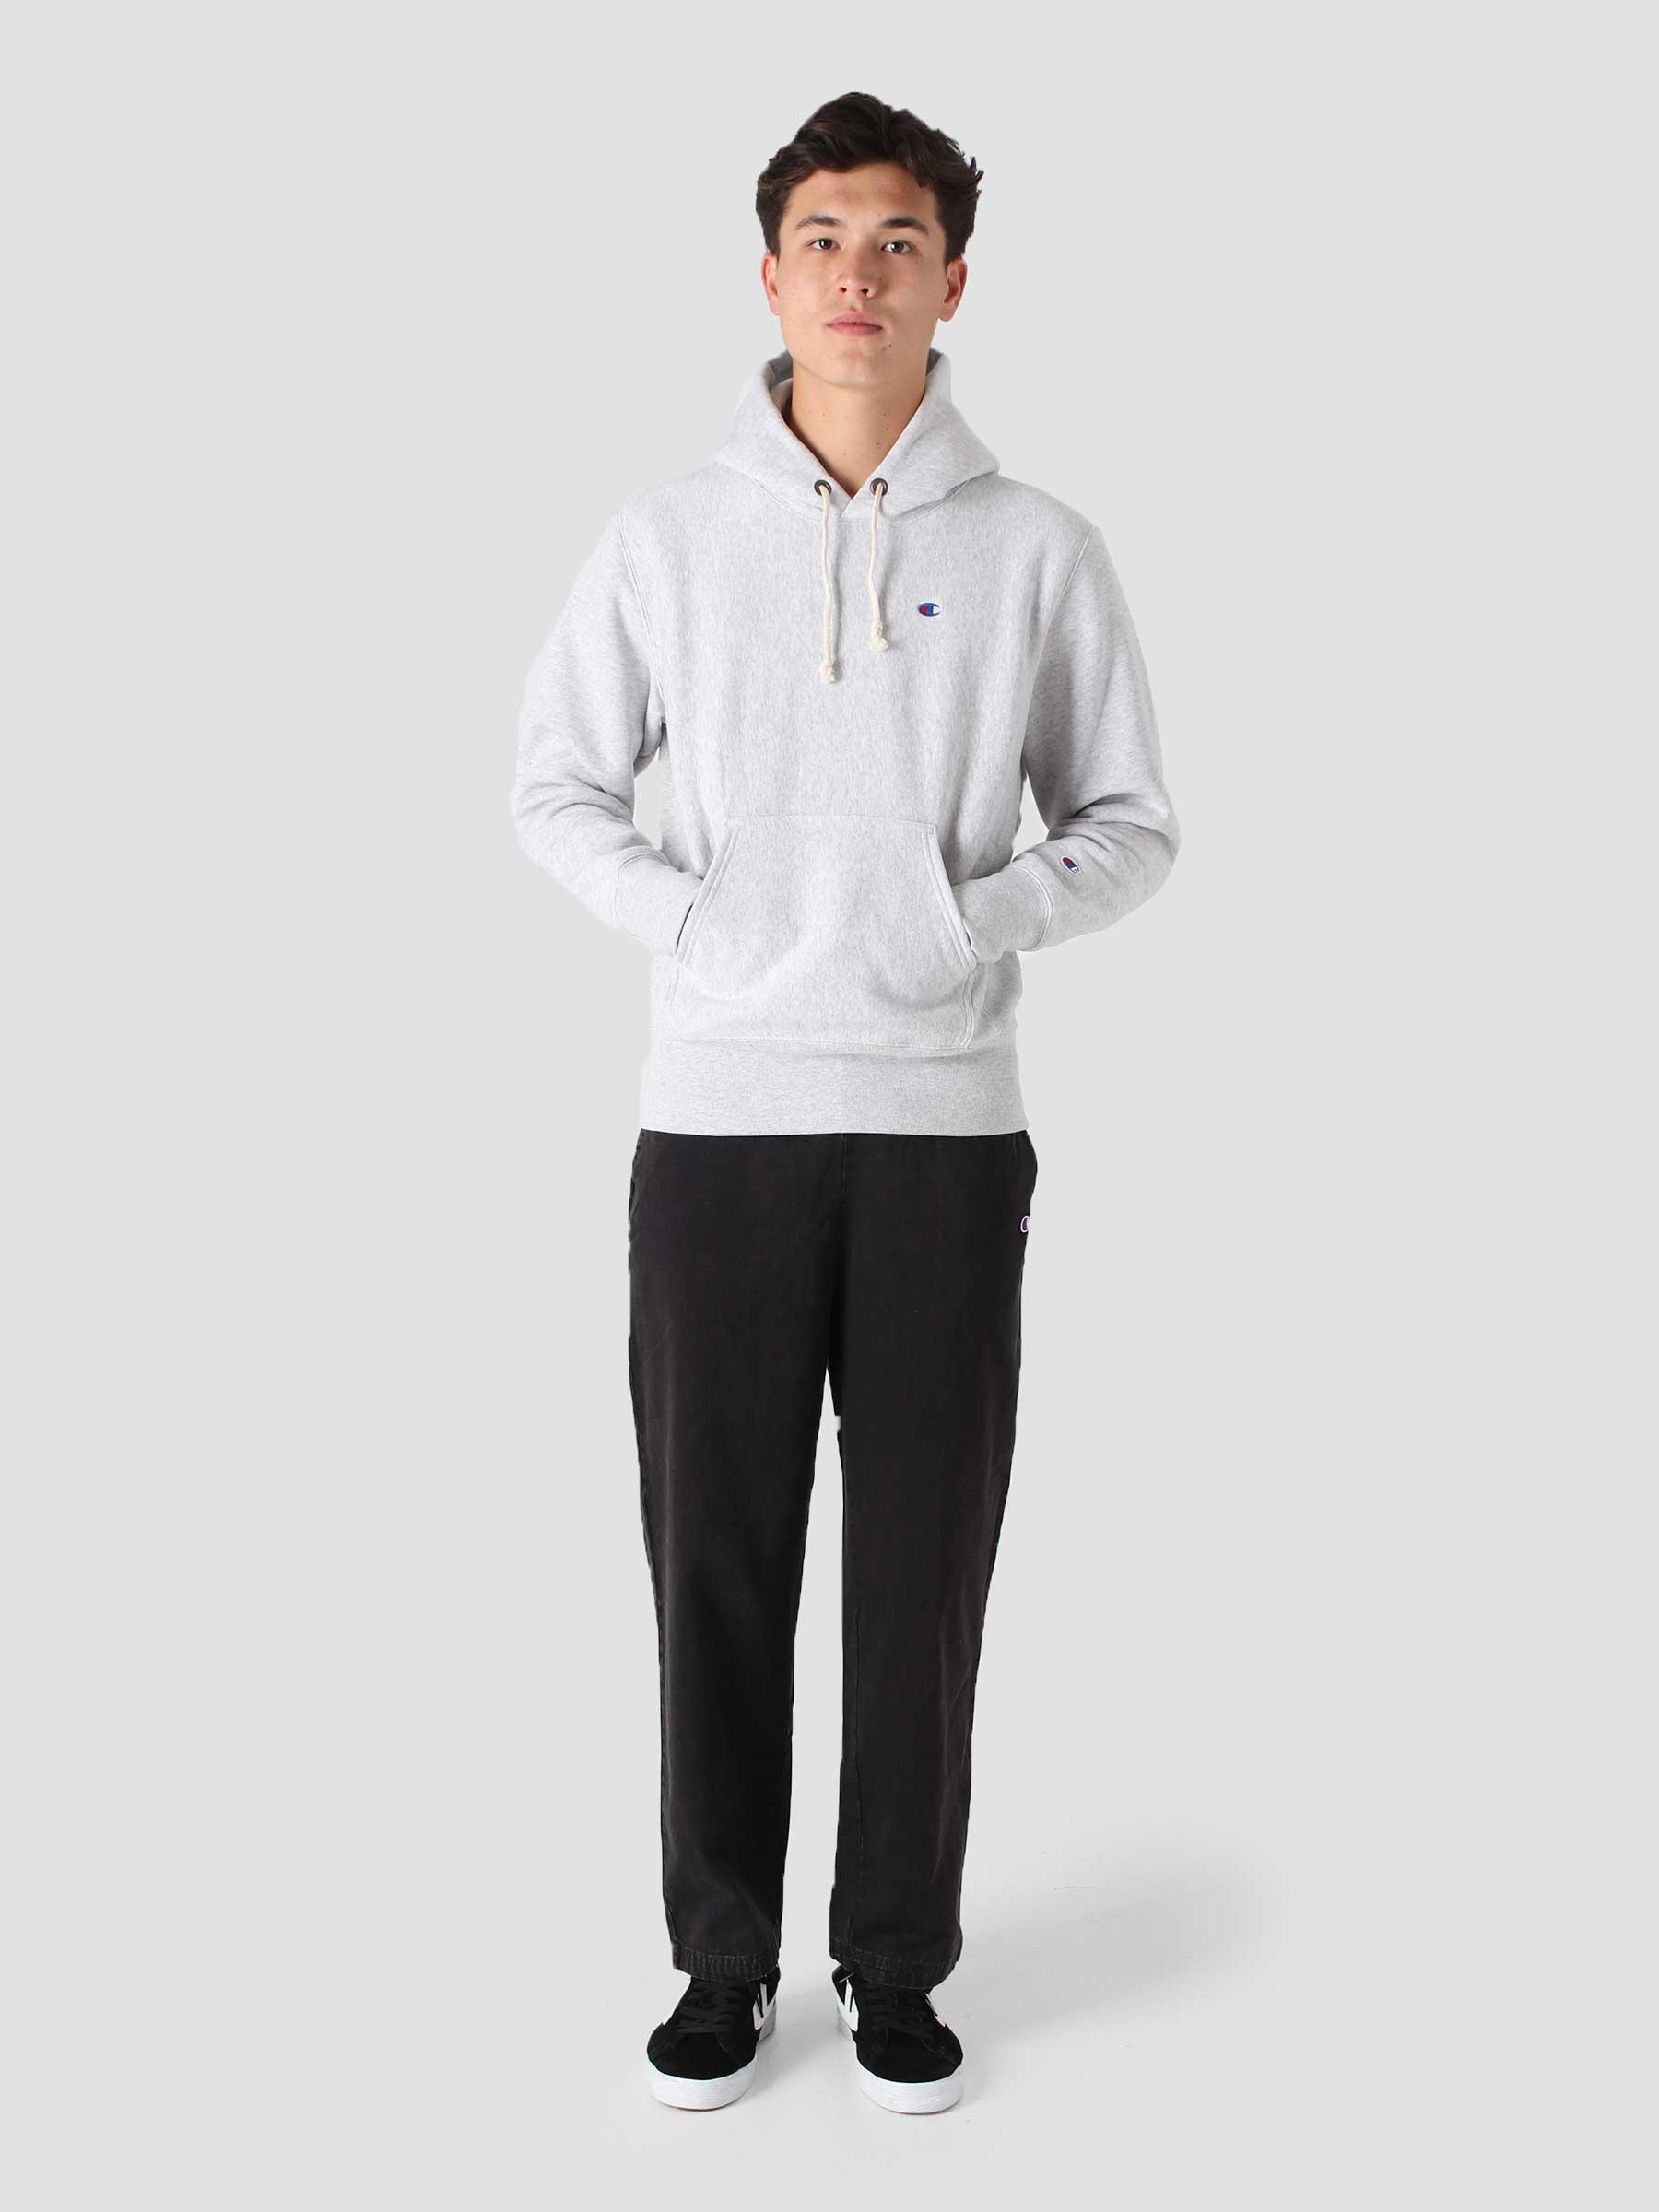 Reverse Weave Soft Fleece Hoodie Grey COKFQ7-EM004